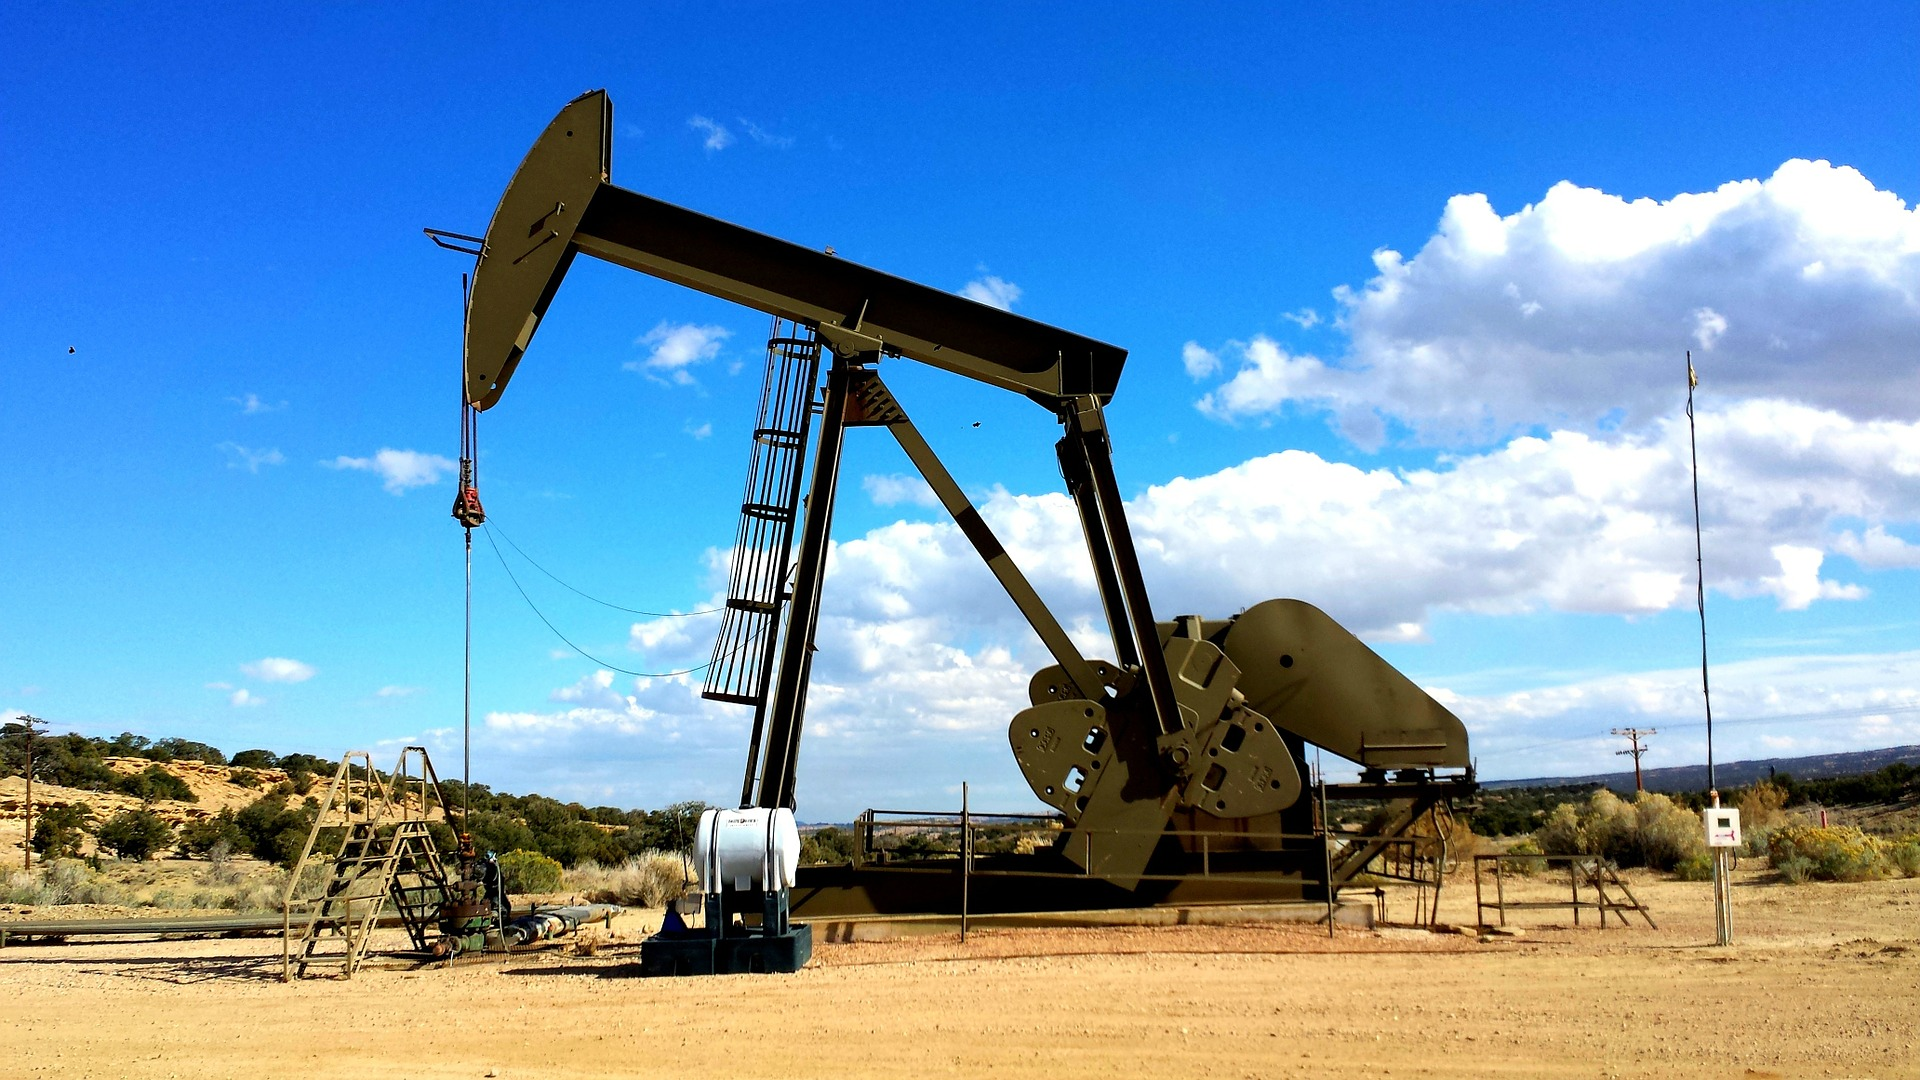 West Qurna-1 ExxonMobil